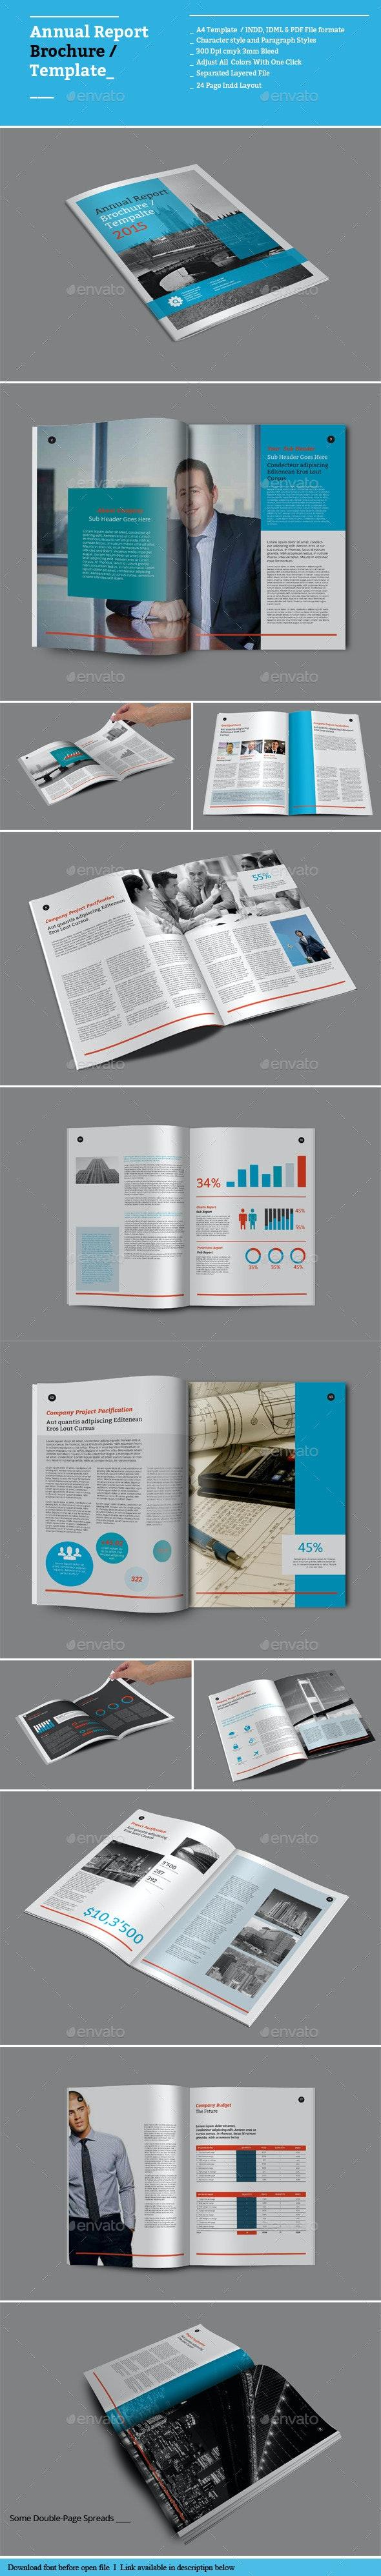 Annual Report Brochure Templates - Informational Brochures